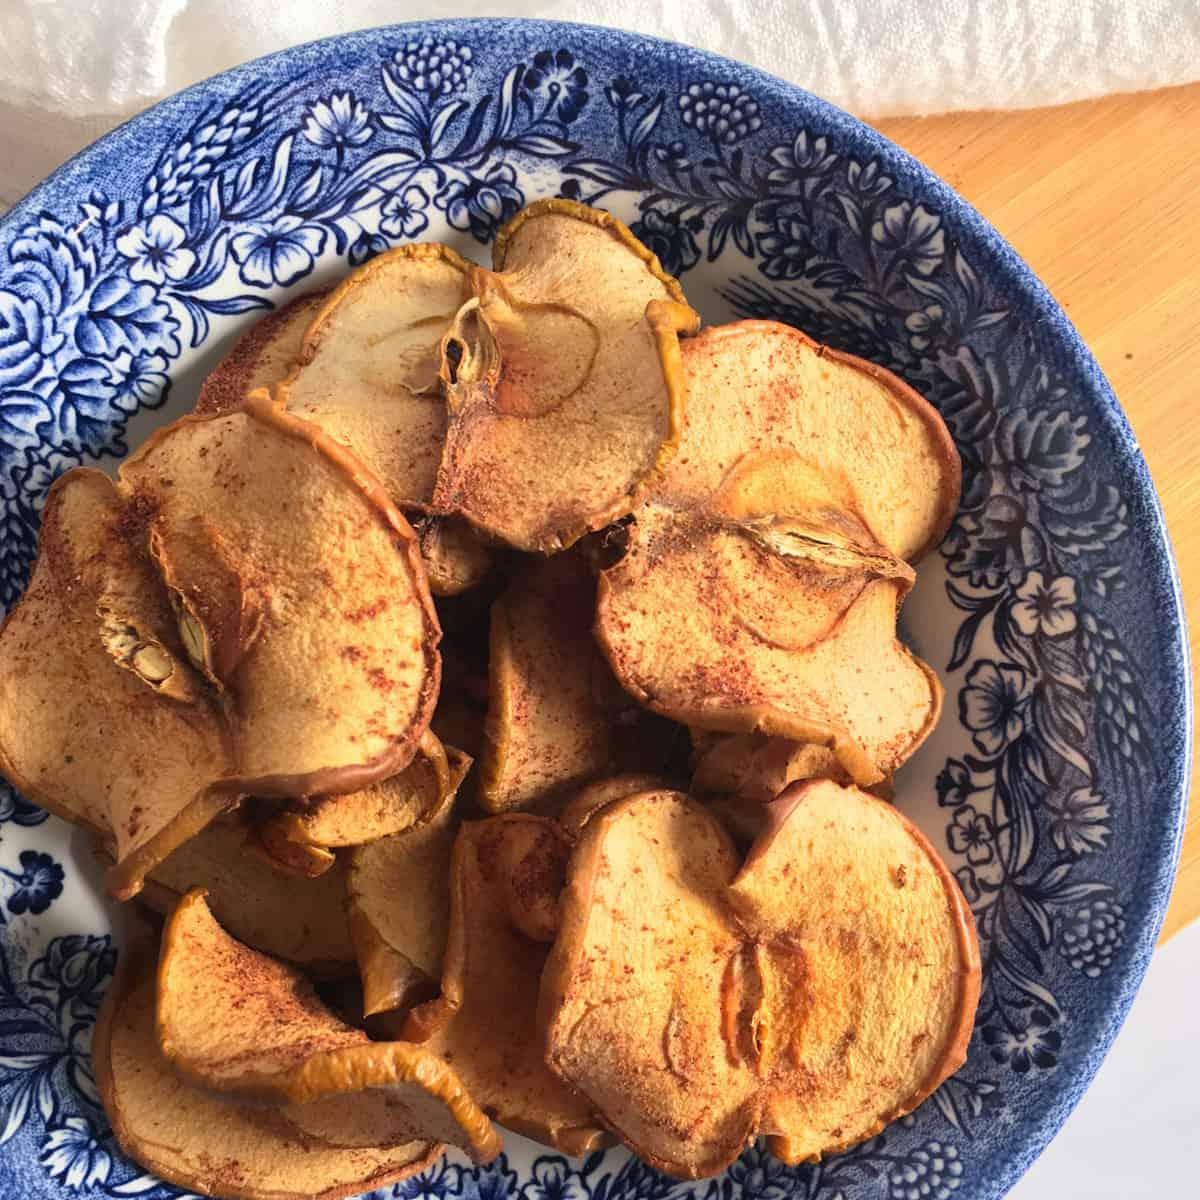 dehydrated cinnamon apple slices